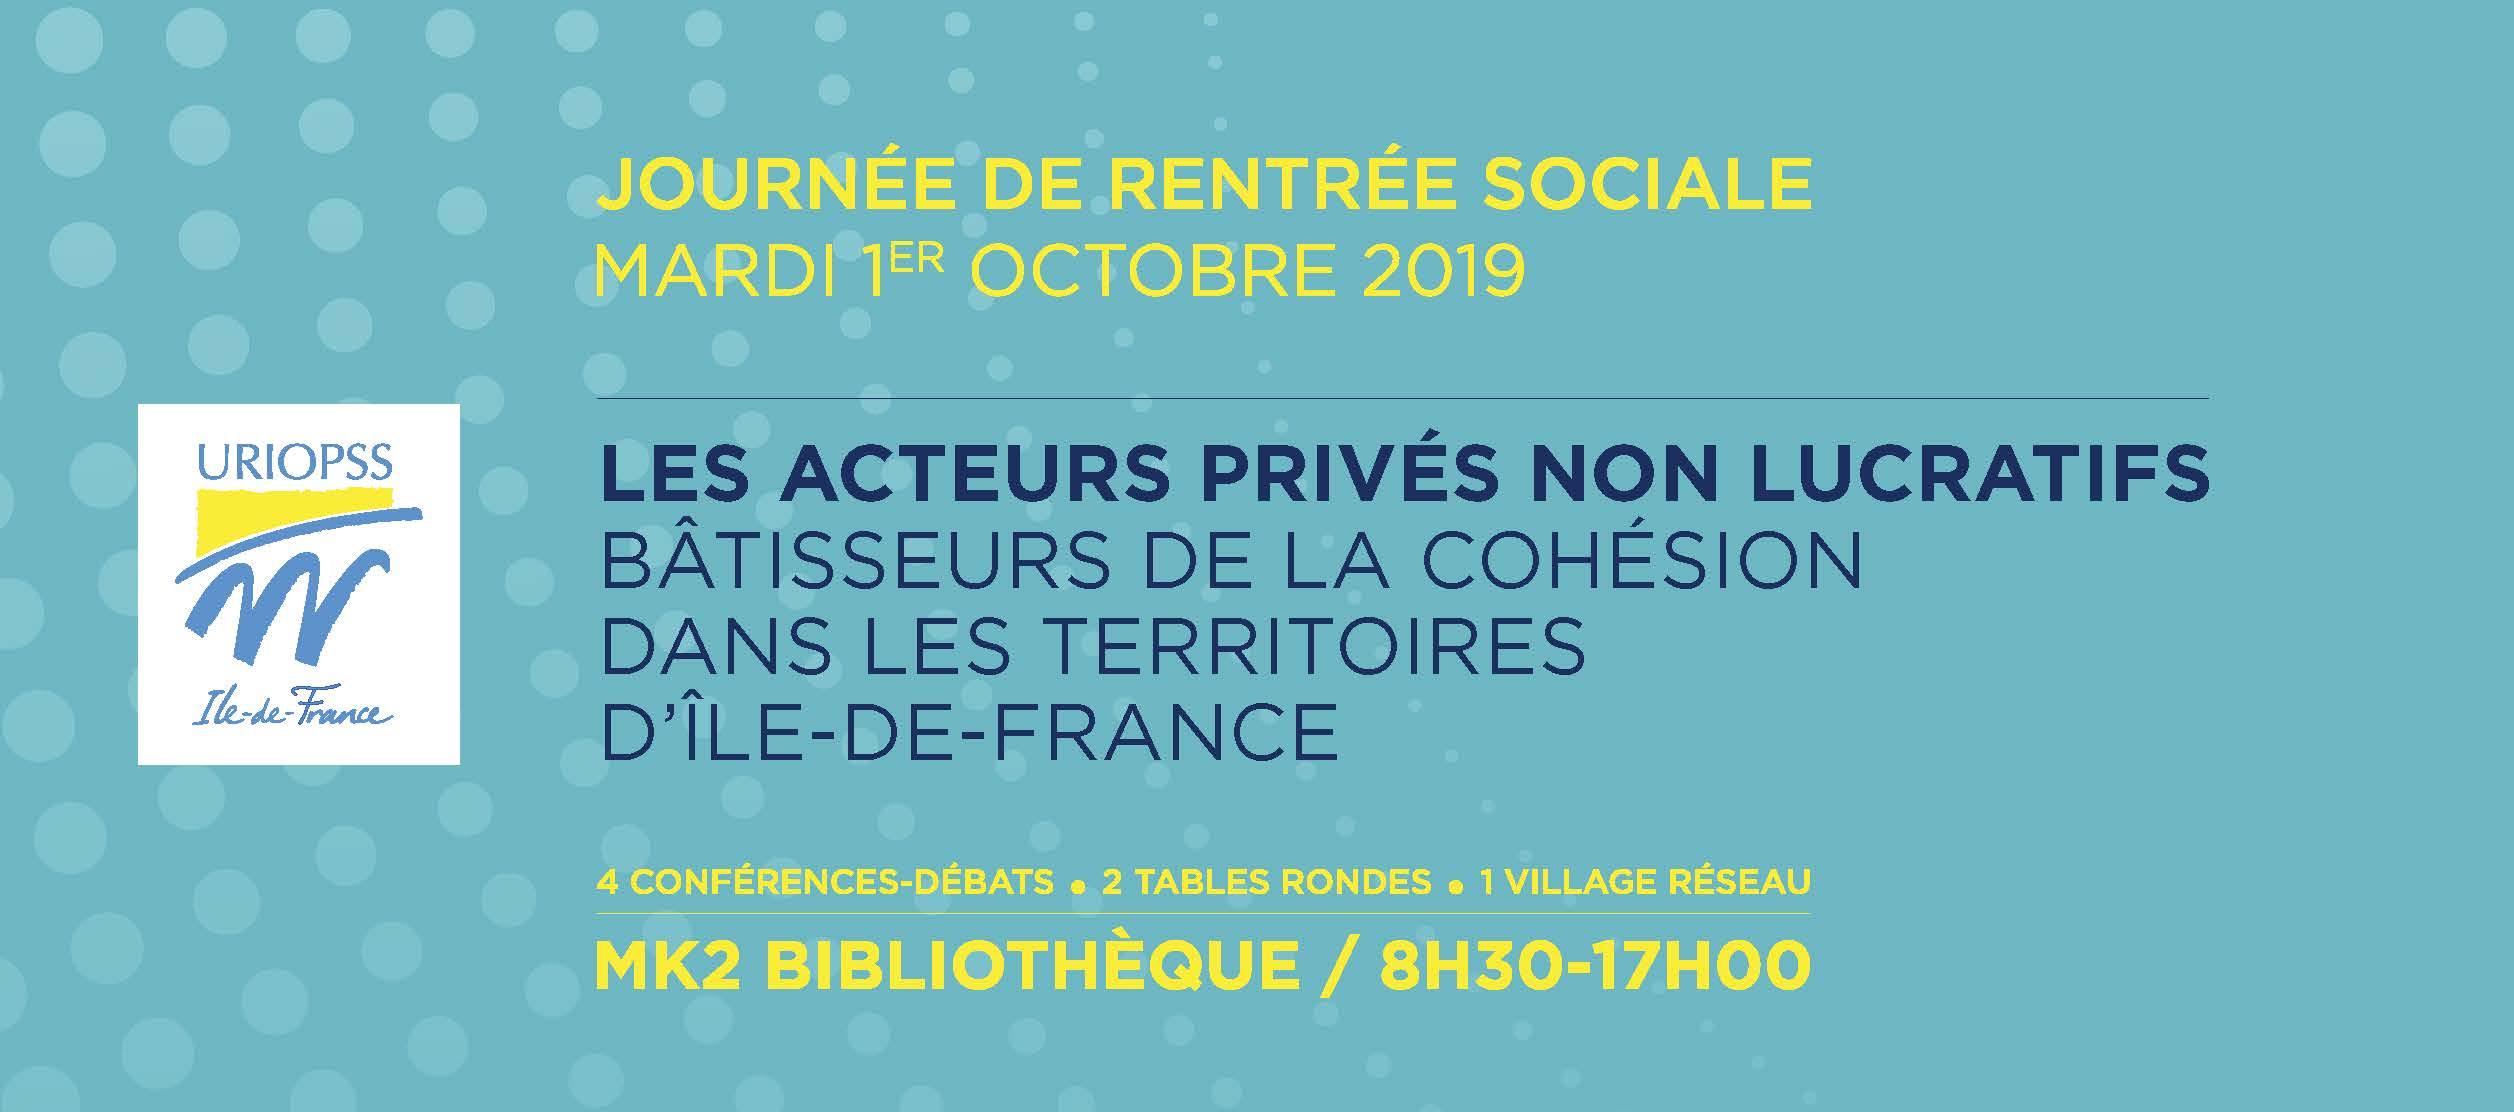 Journée de Rentrée Sociale 2019 URIOPSS Ile-de-France